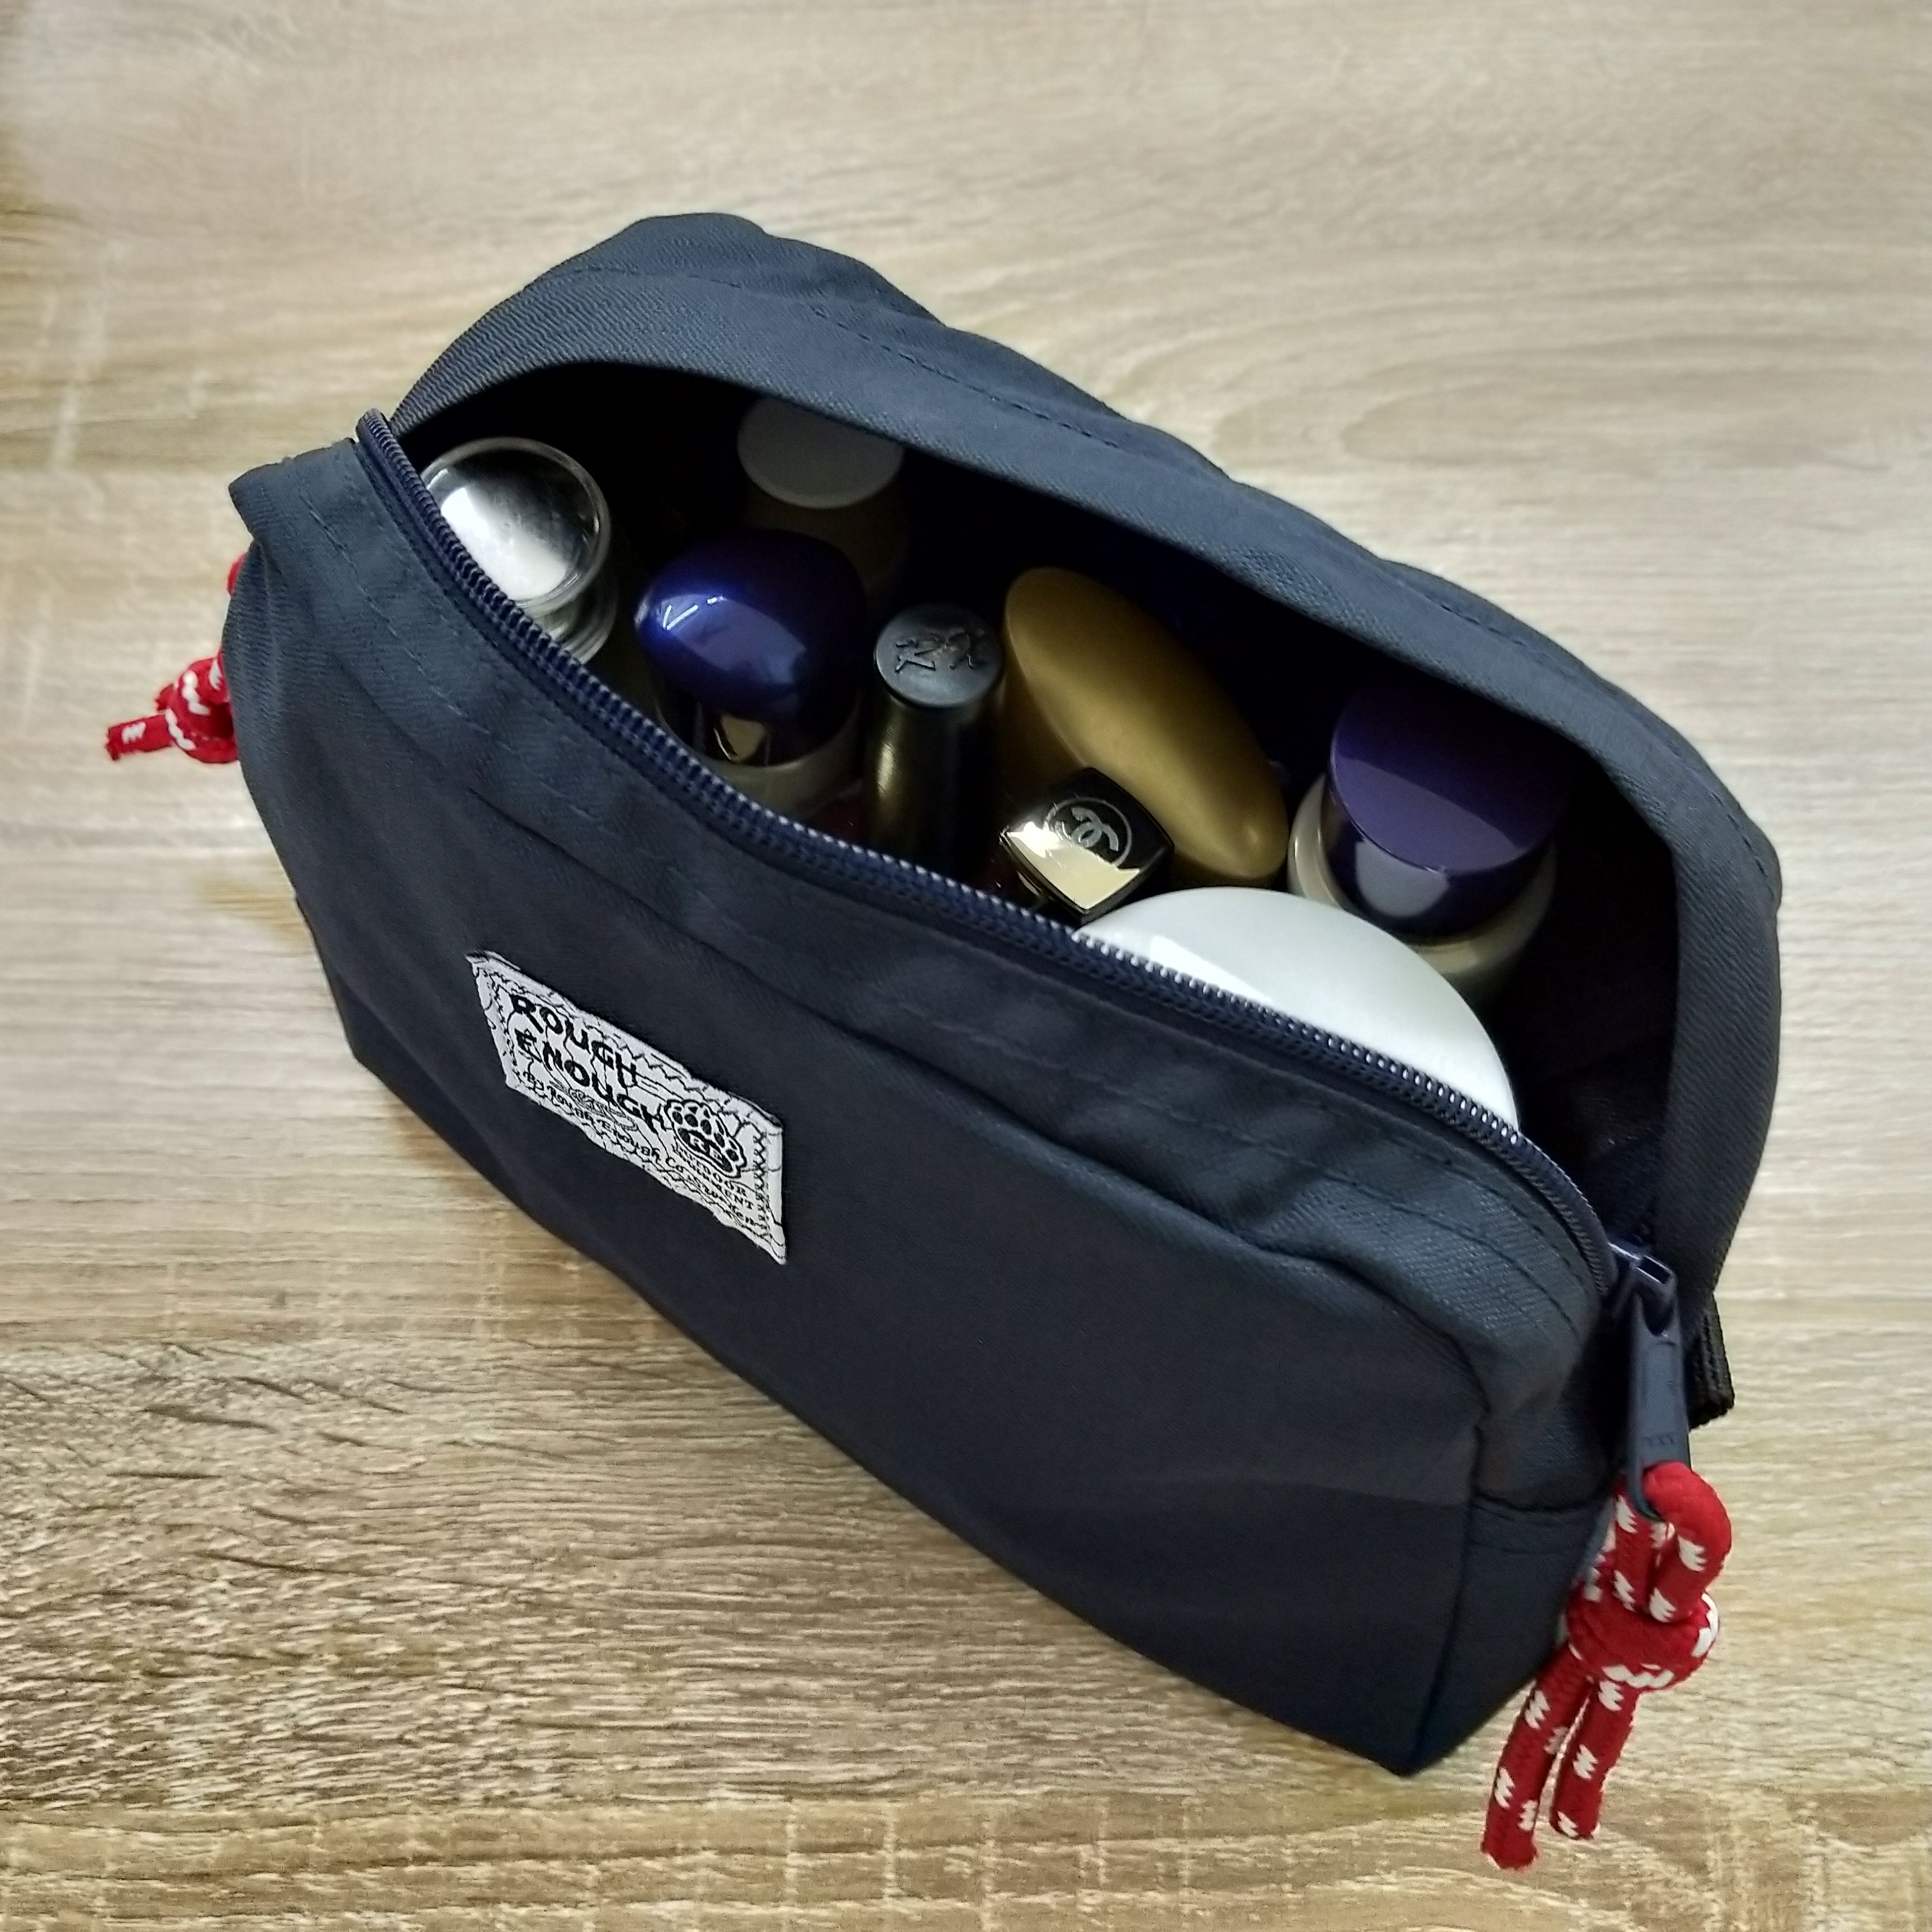 Gift Mens Boys Girls Personalised Wash Accessories Bag,Toiletry Bag,Travel Bag